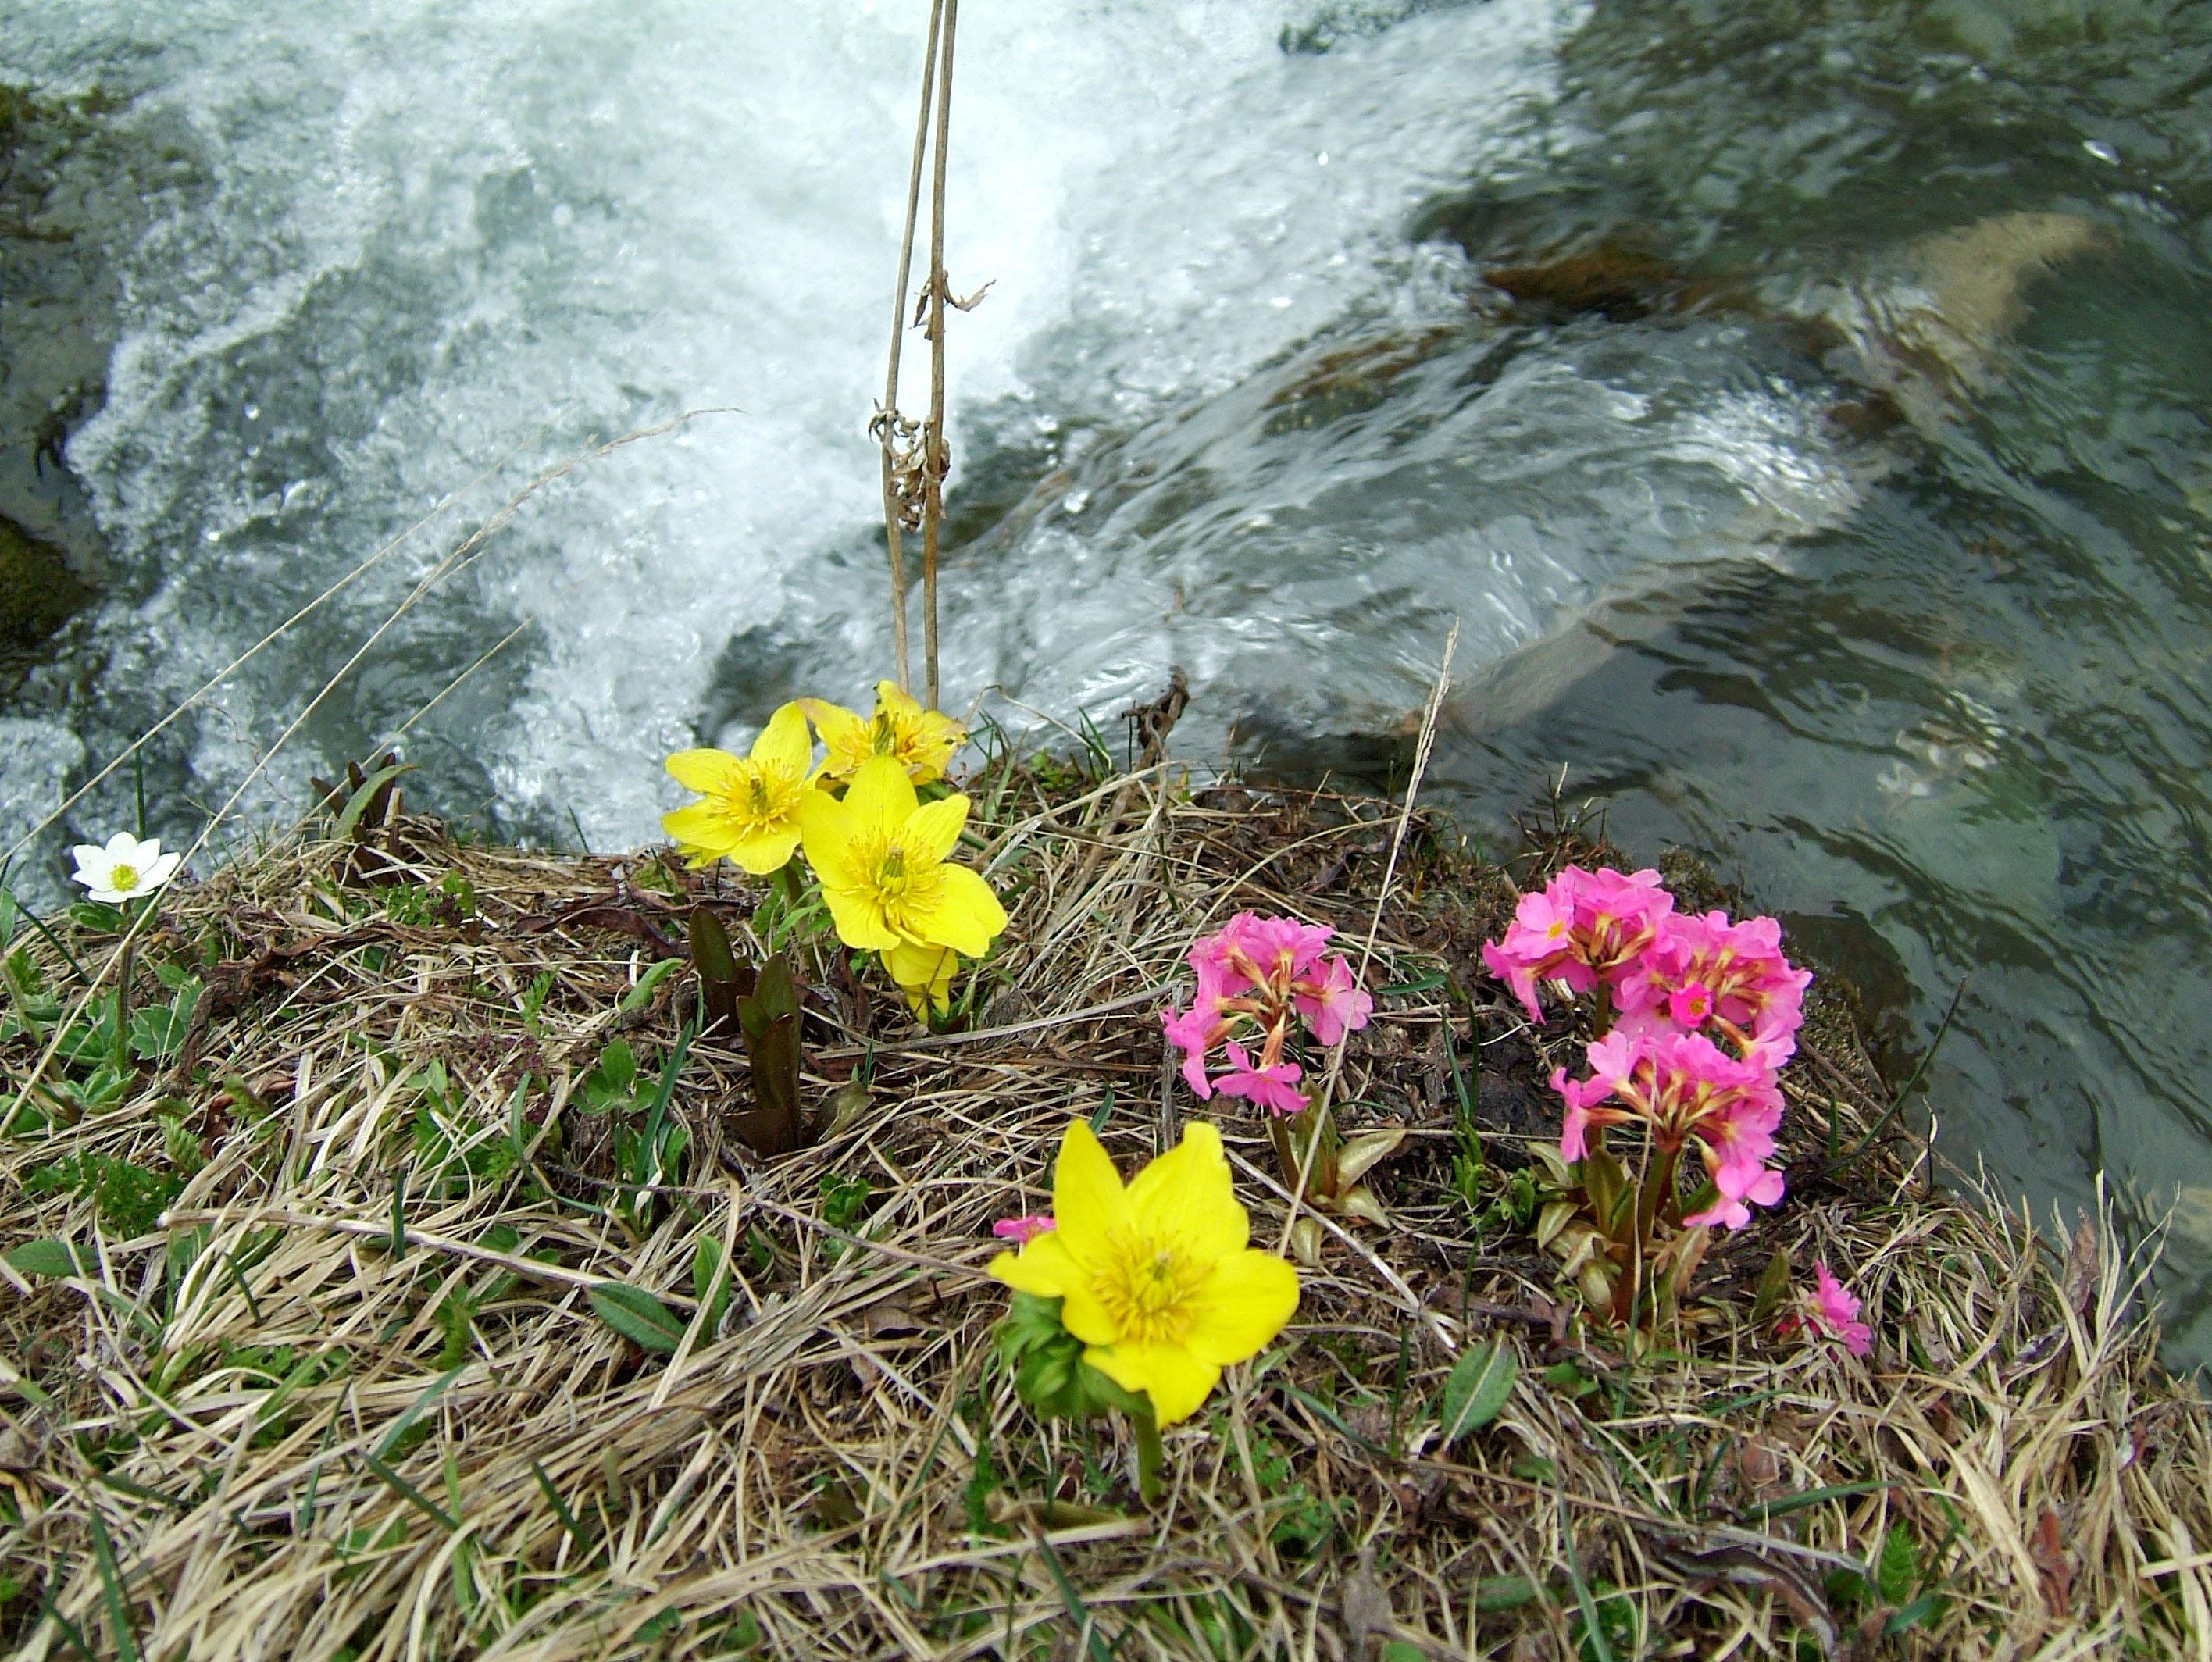 Local Wild spring flowers Srinagar Kashmir India 14